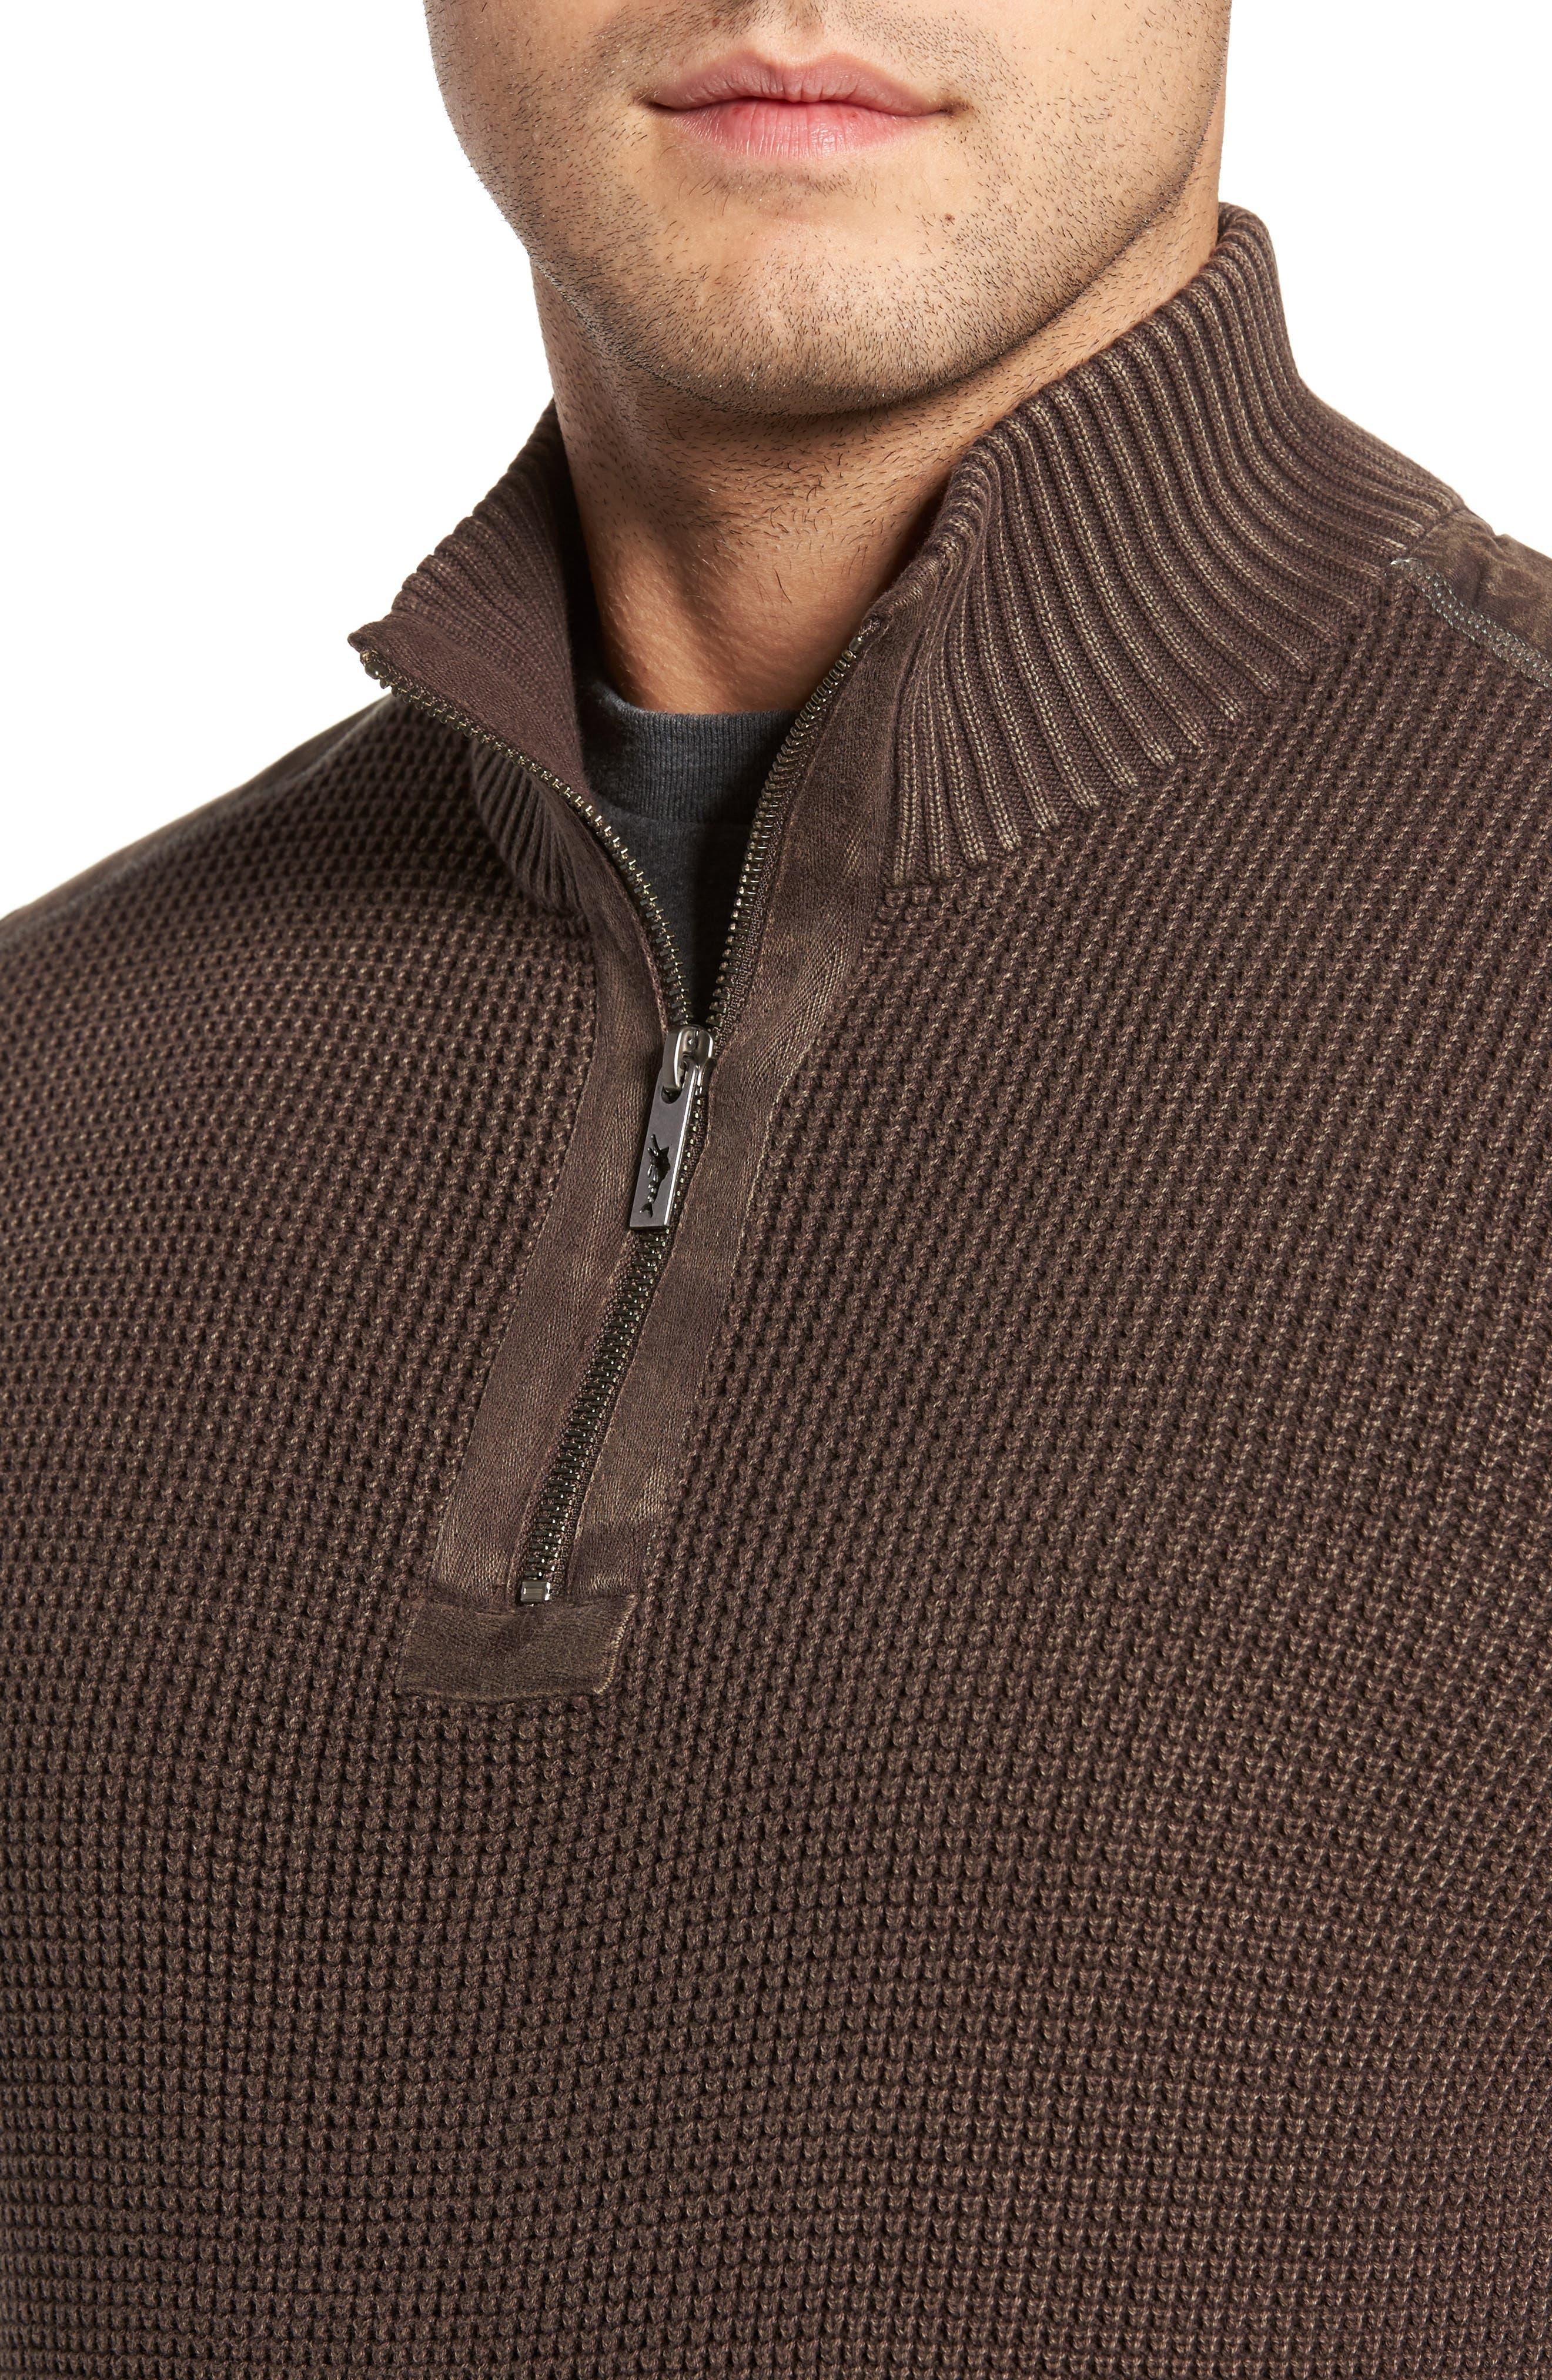 'Coastal Shores' Quarter Zip Sweater,                             Alternate thumbnail 4, color,                             Tilth